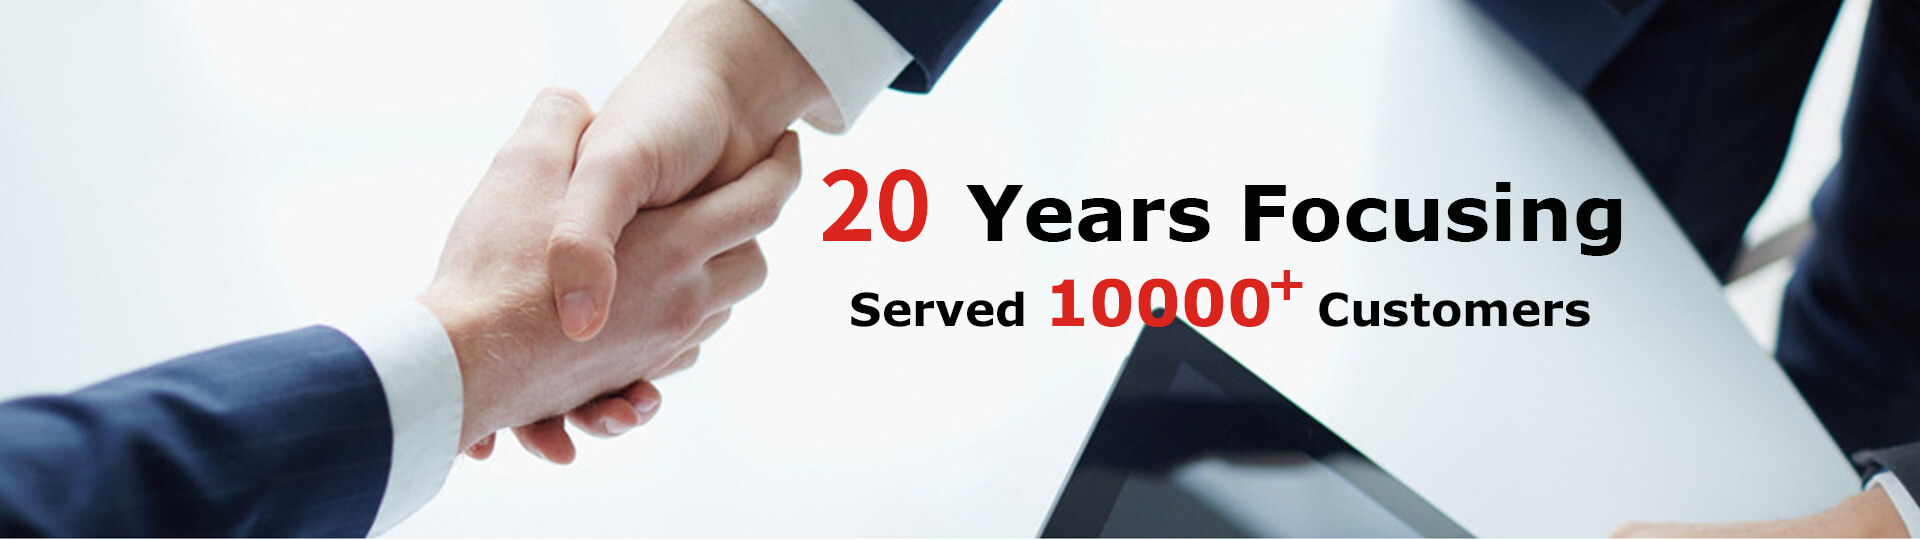 20 Years Focusing Served 10000+ Customers